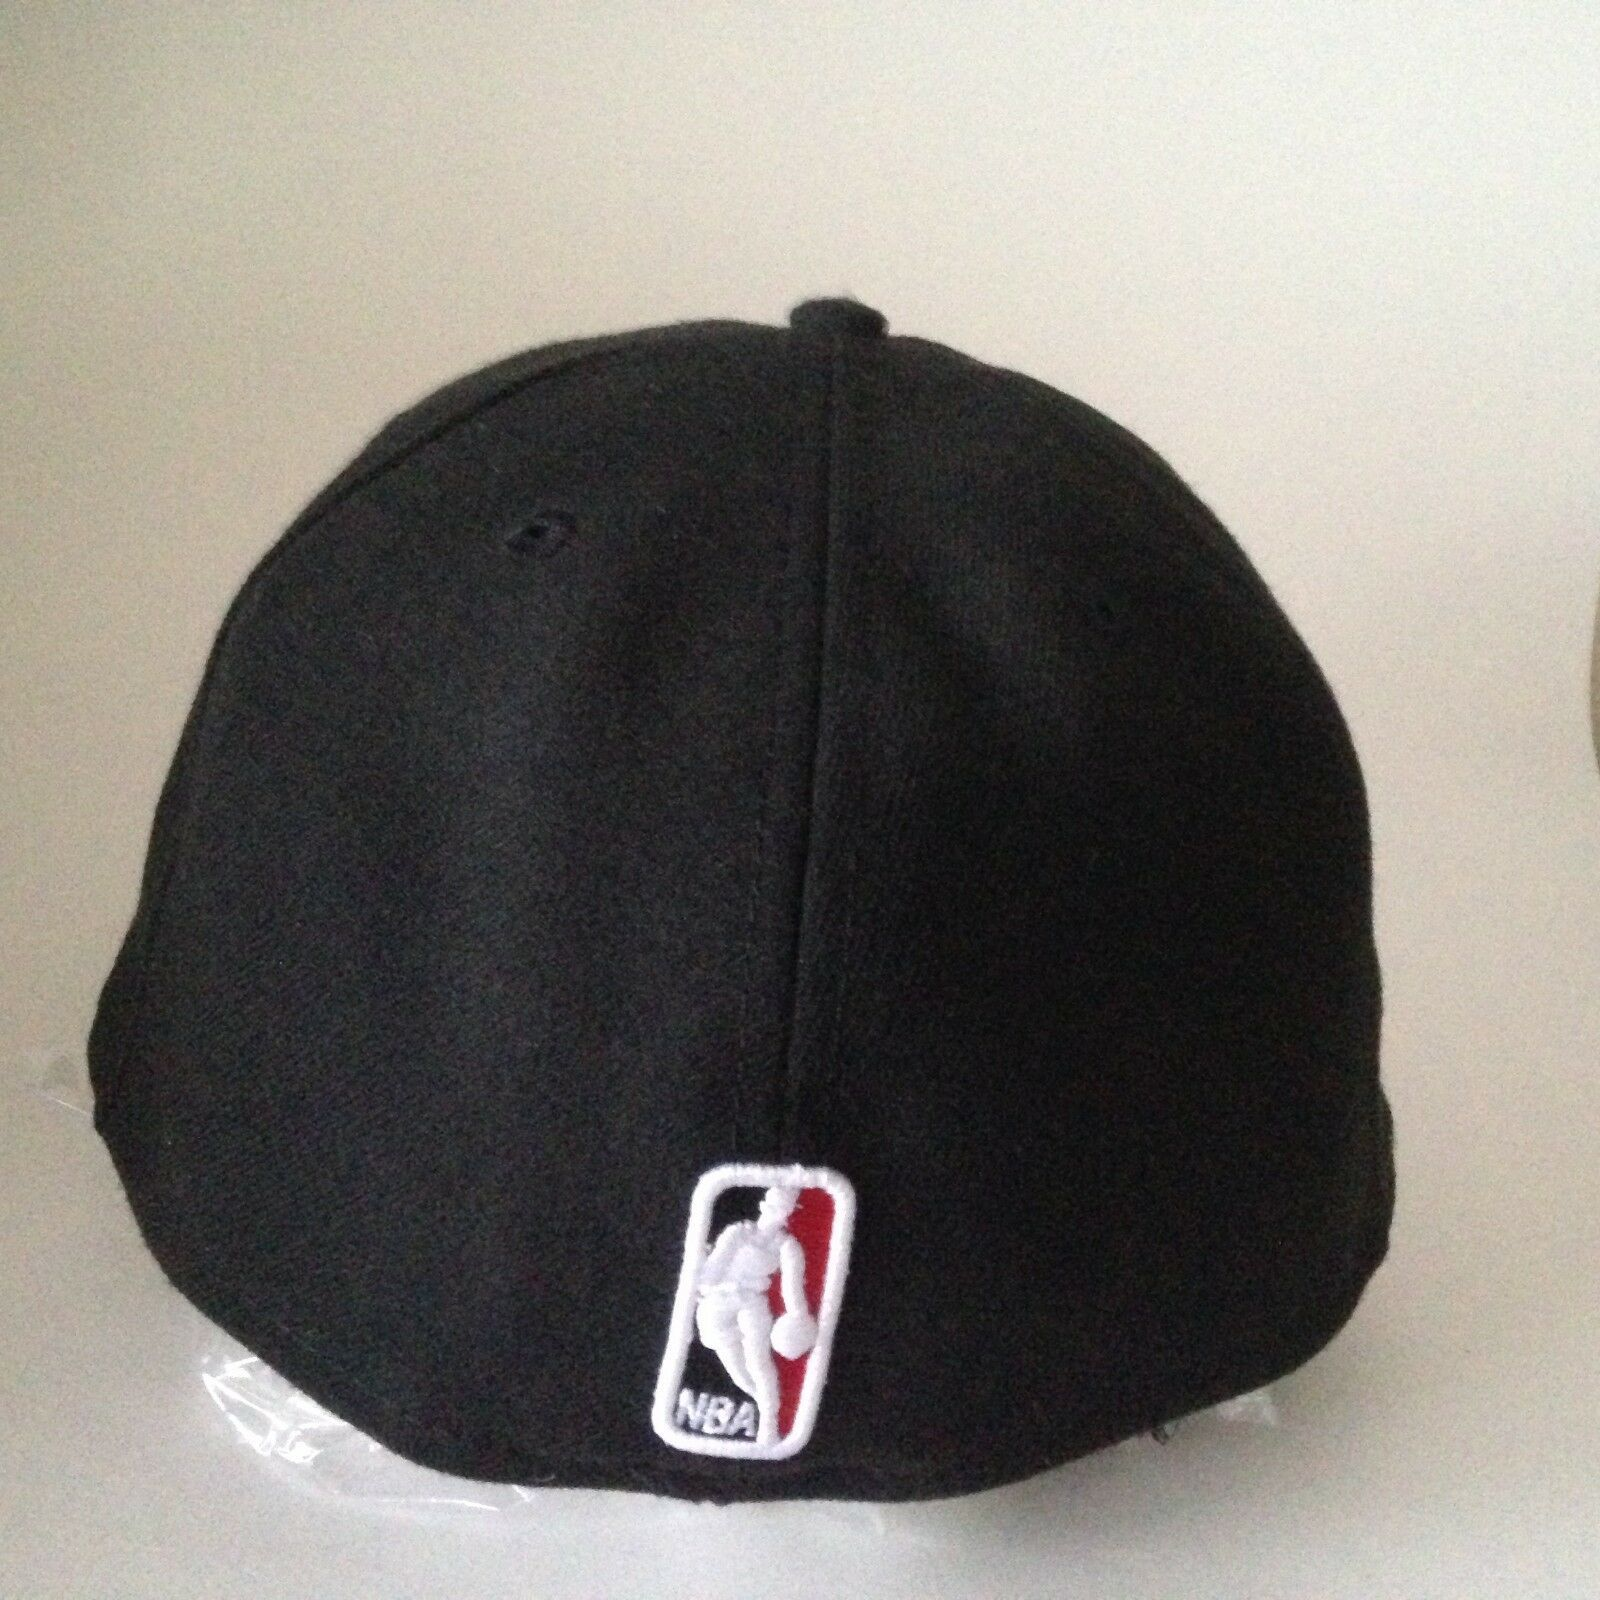 Miami Heat NBA Fitted Cap Hat Finals 2006/2012 Champions New Era NWT Size 7.5